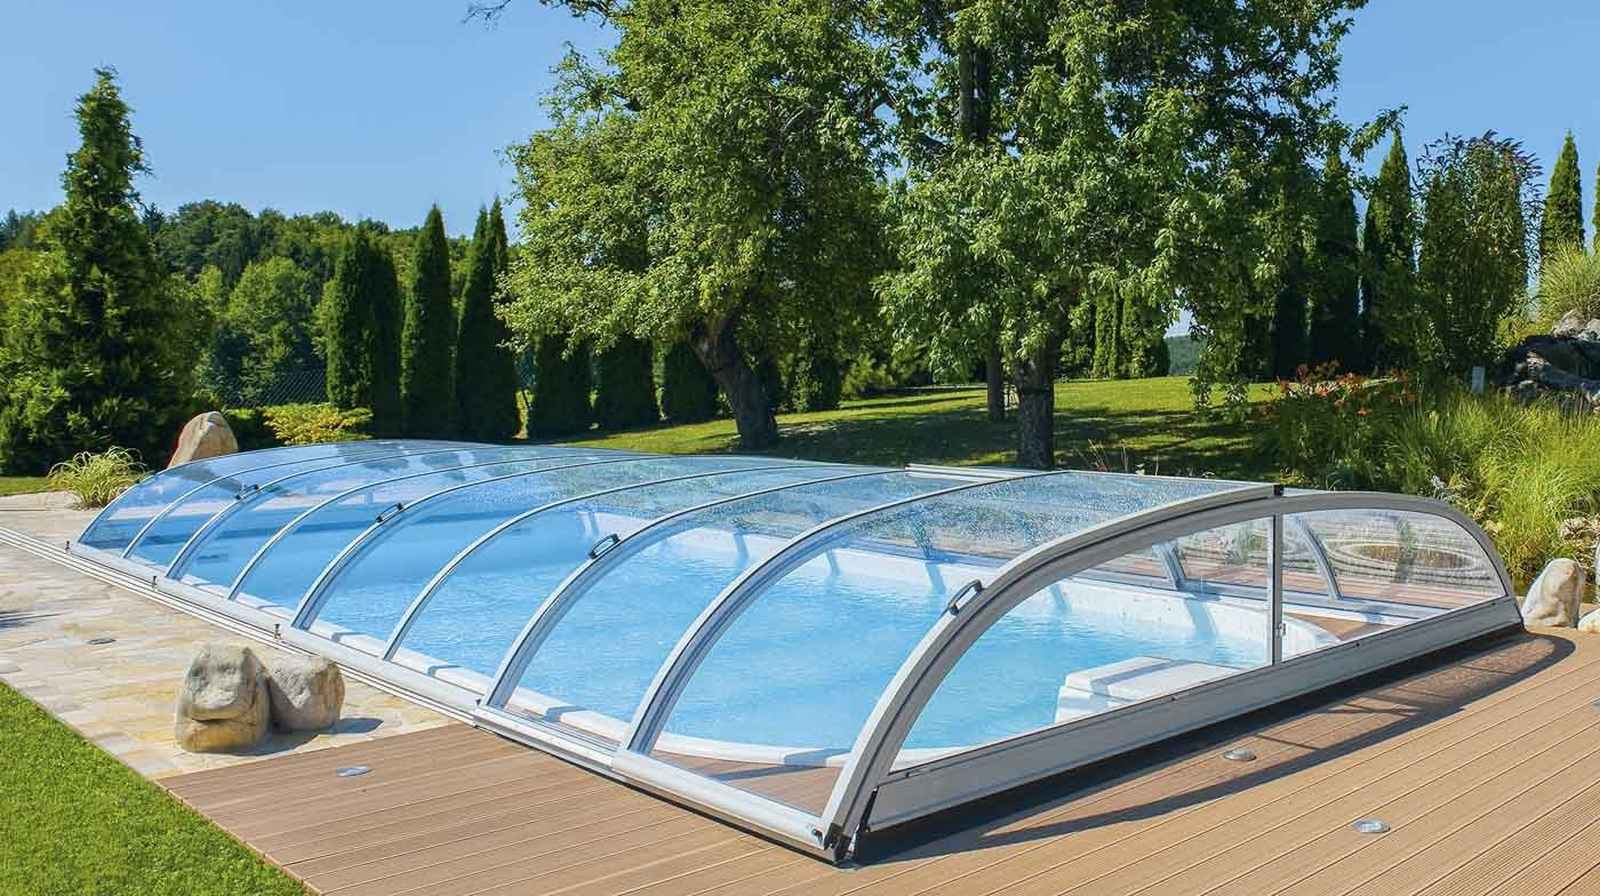 polyfaser schwimmbad berdachung diamant schwimmbadtechnik frankfurt. Black Bedroom Furniture Sets. Home Design Ideas